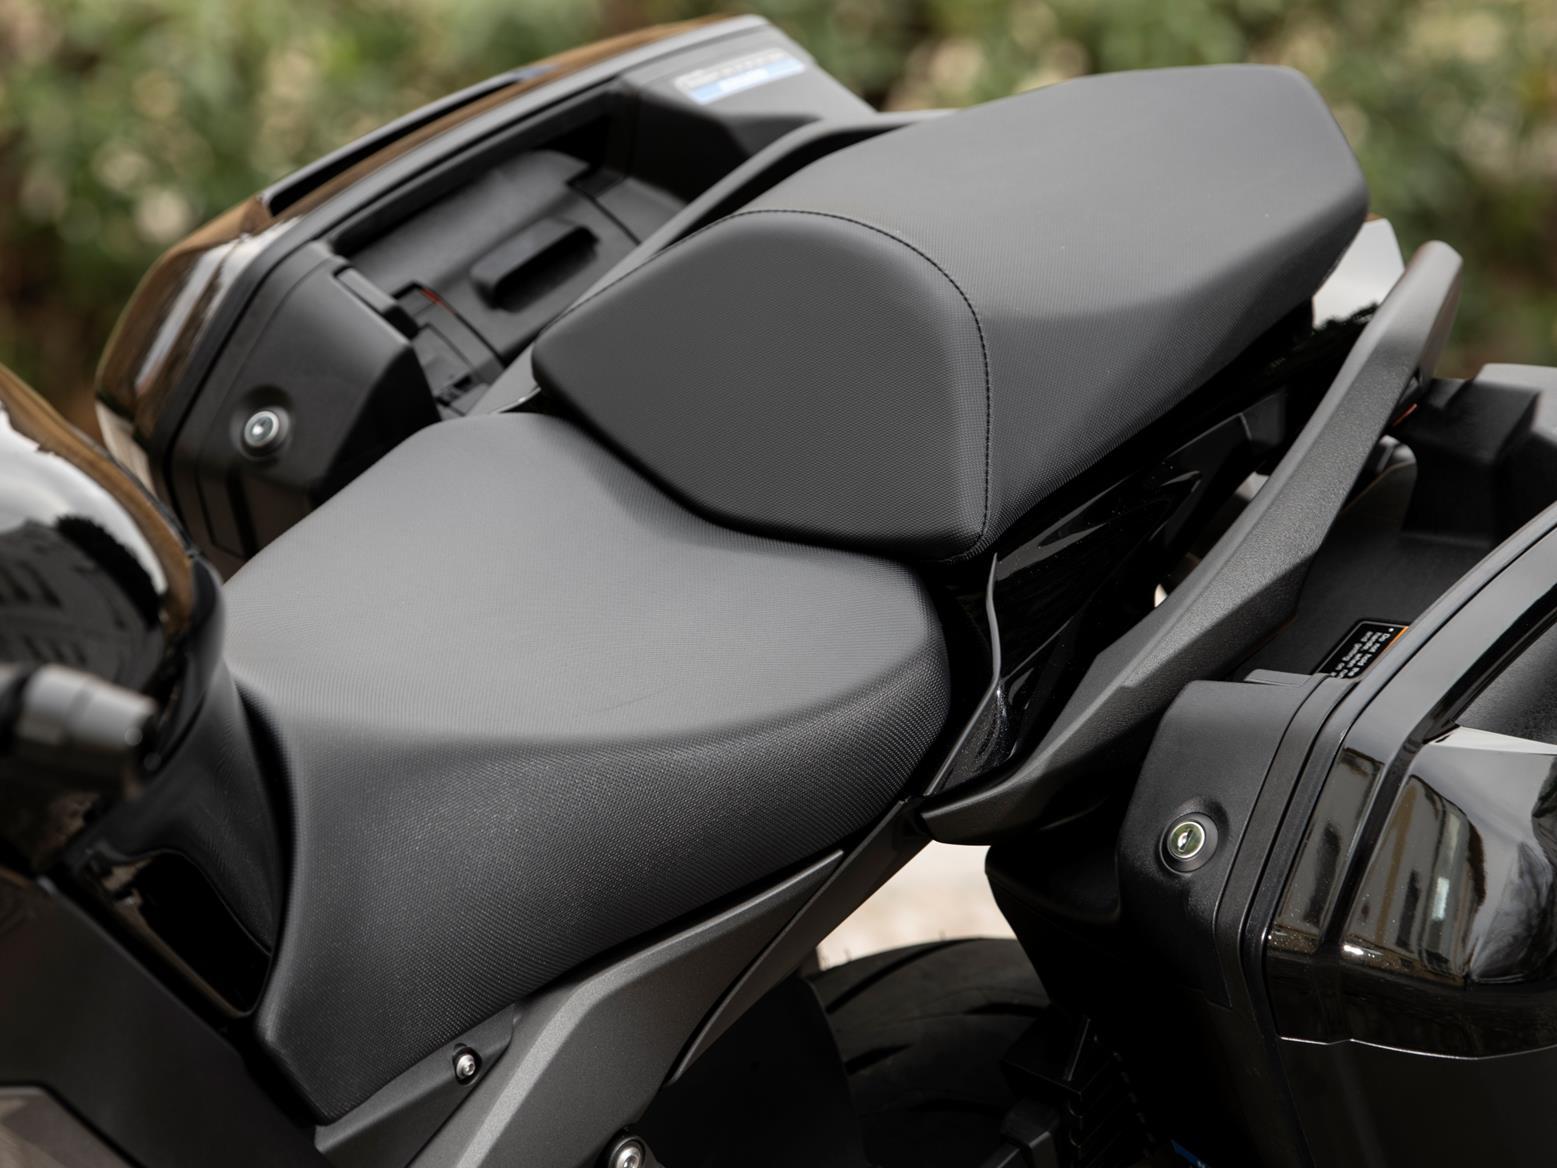 Kawasaki Ninja 1000SX seat